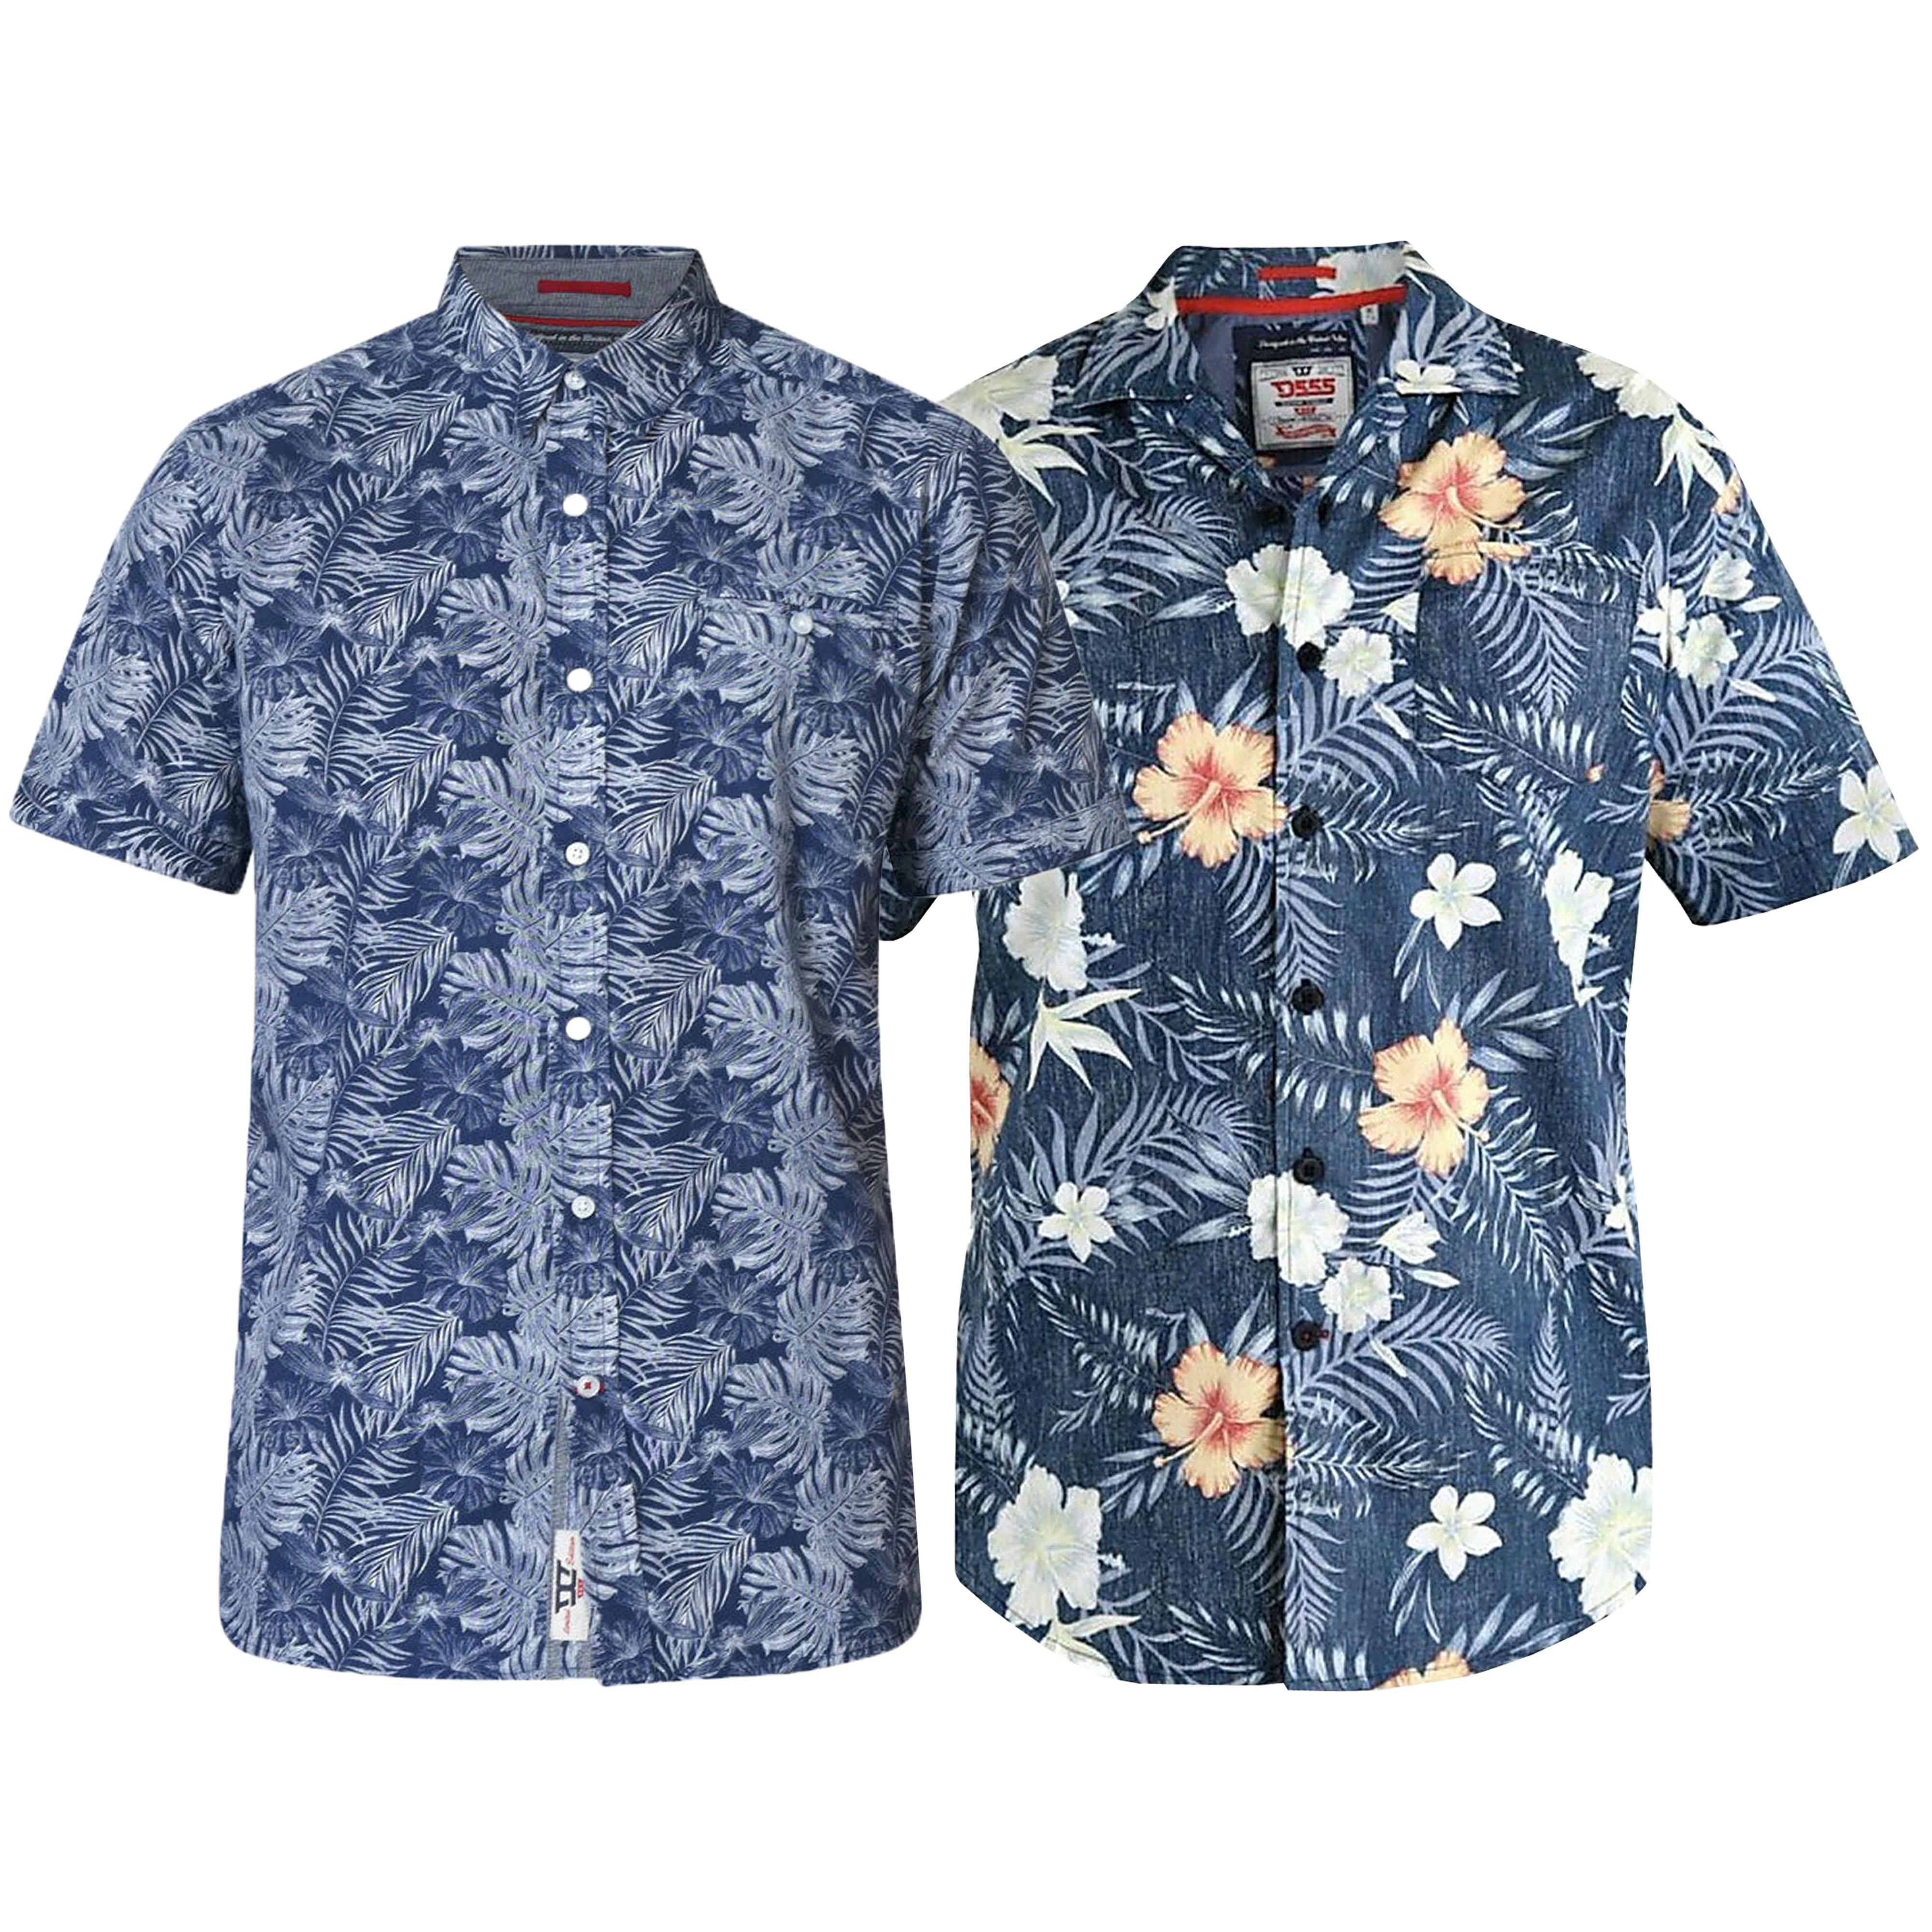 Mens-Hawaii-Shirt-D555-Duke-Cotton-Floral-Big-King-Size-Short-Sleeved-Summer-New thumbnail 3